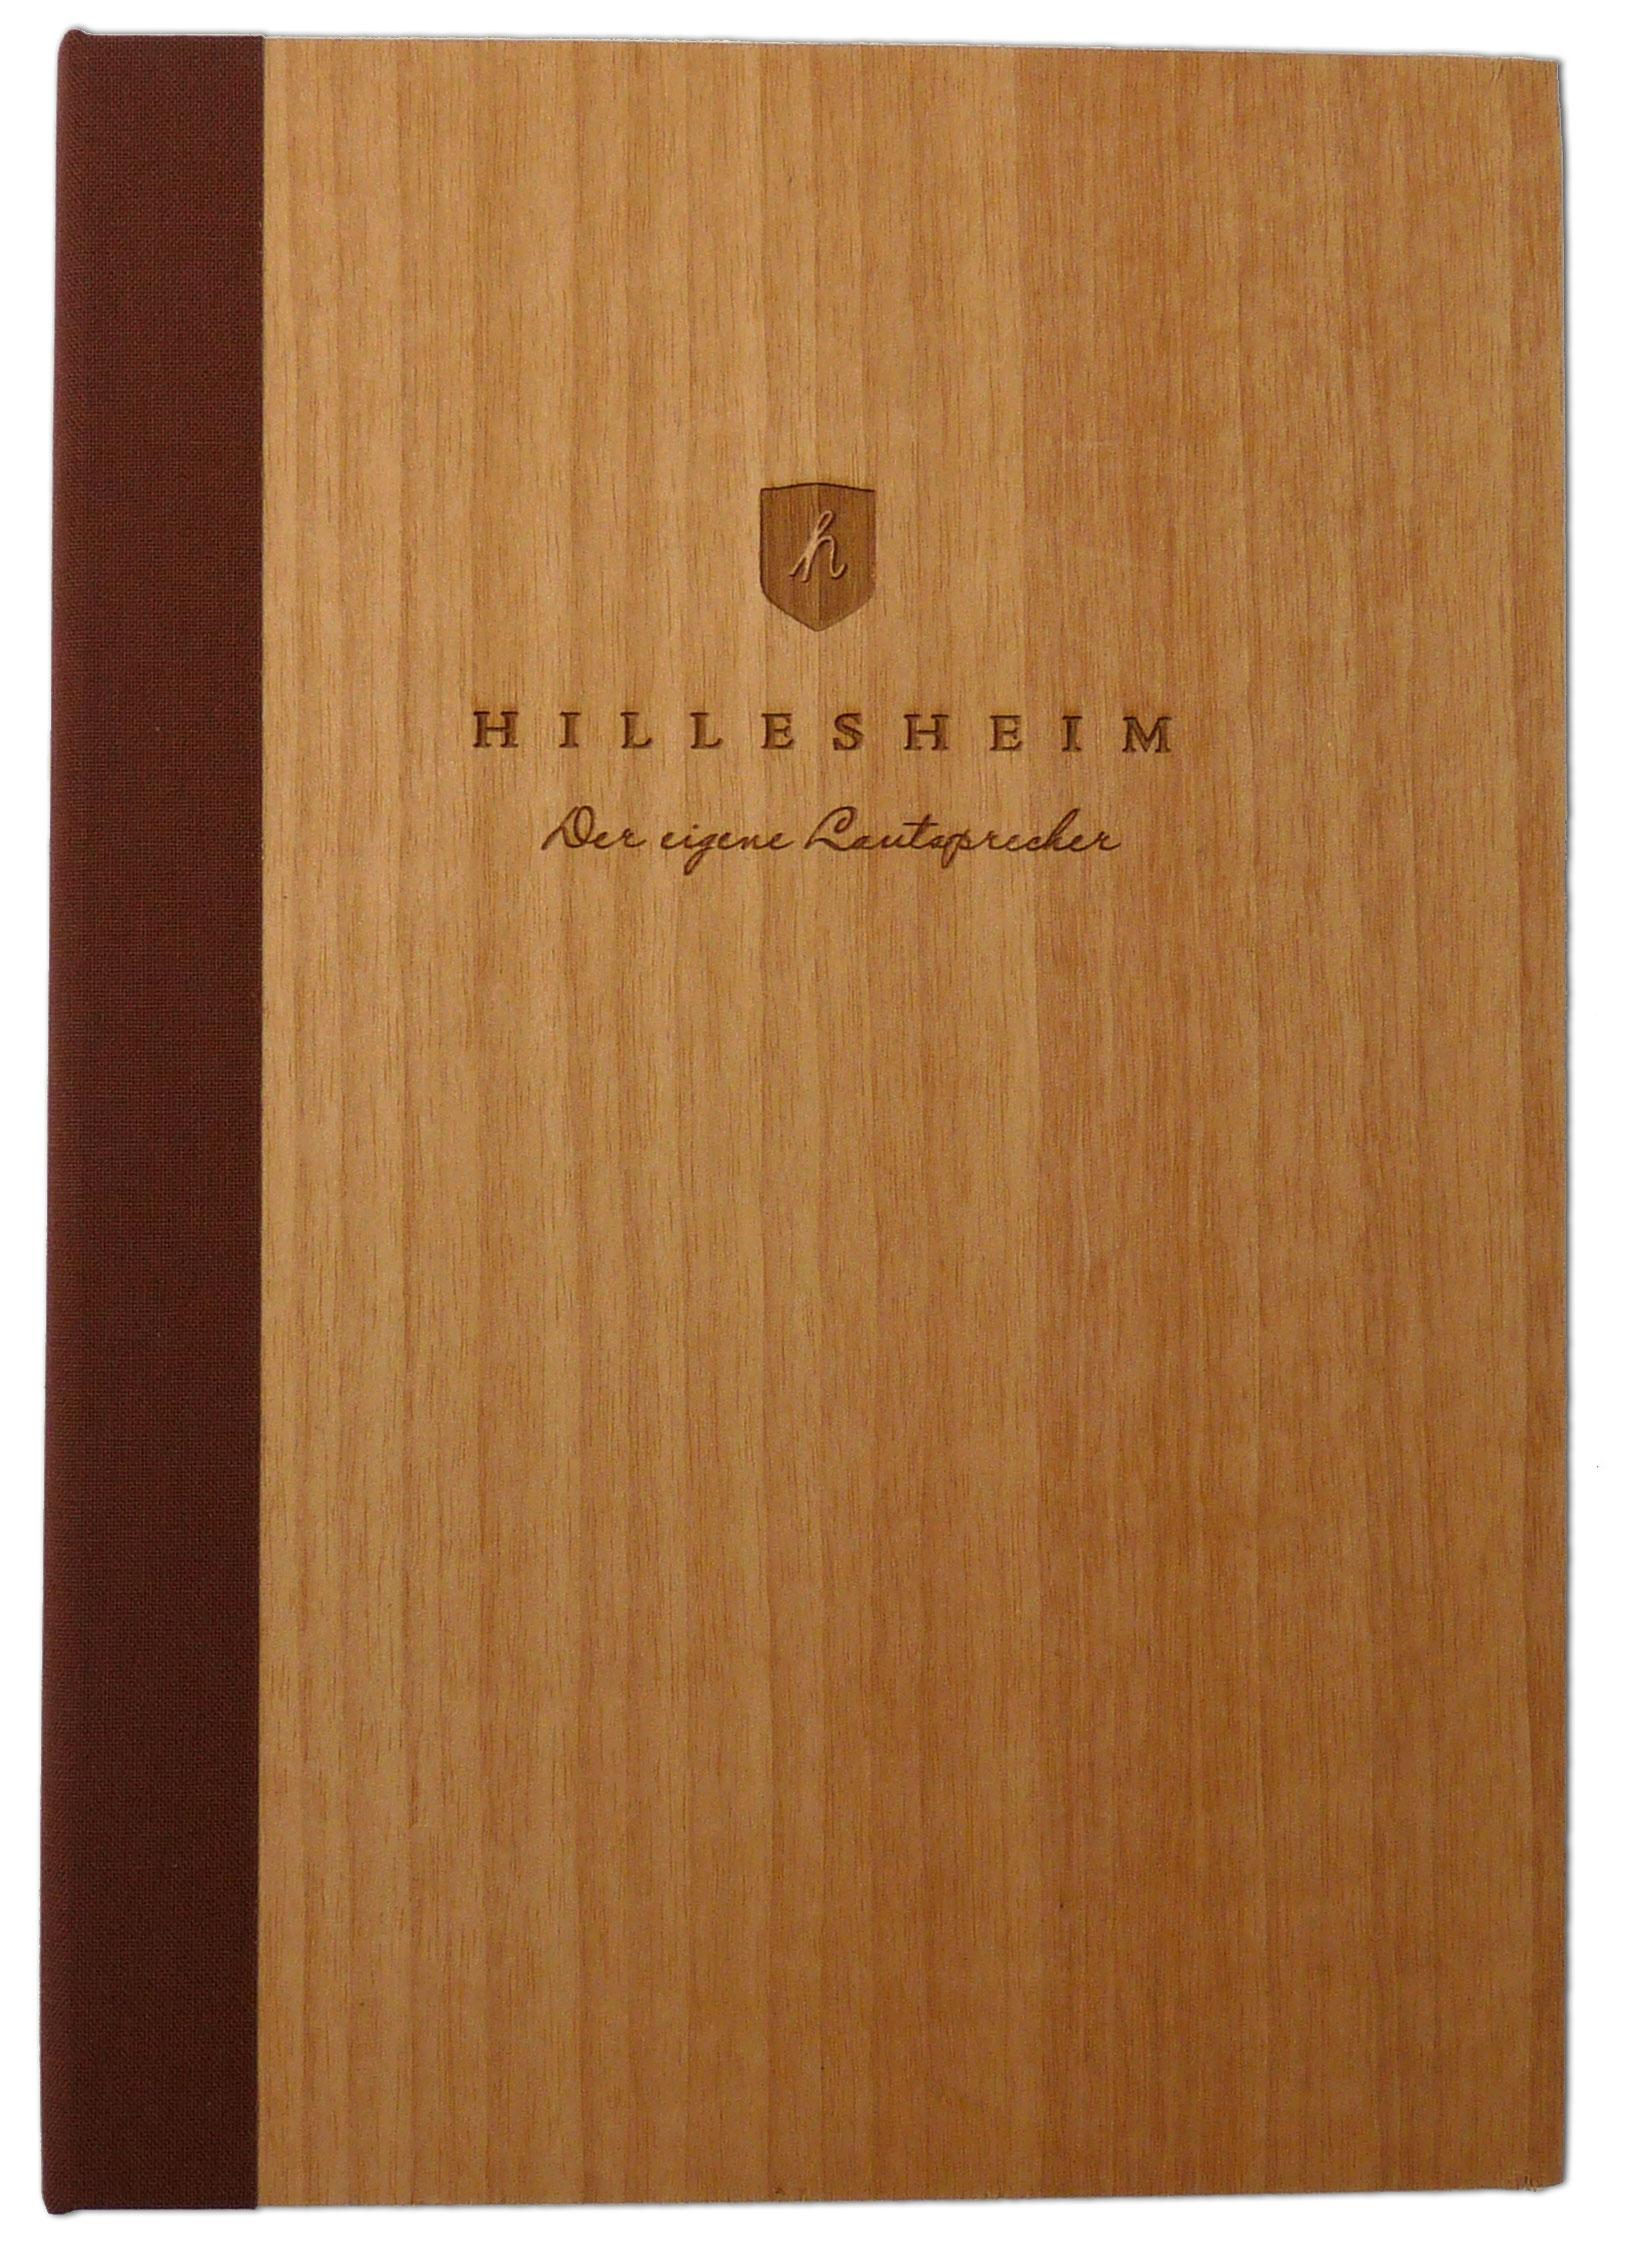 Holzdeckelbuch